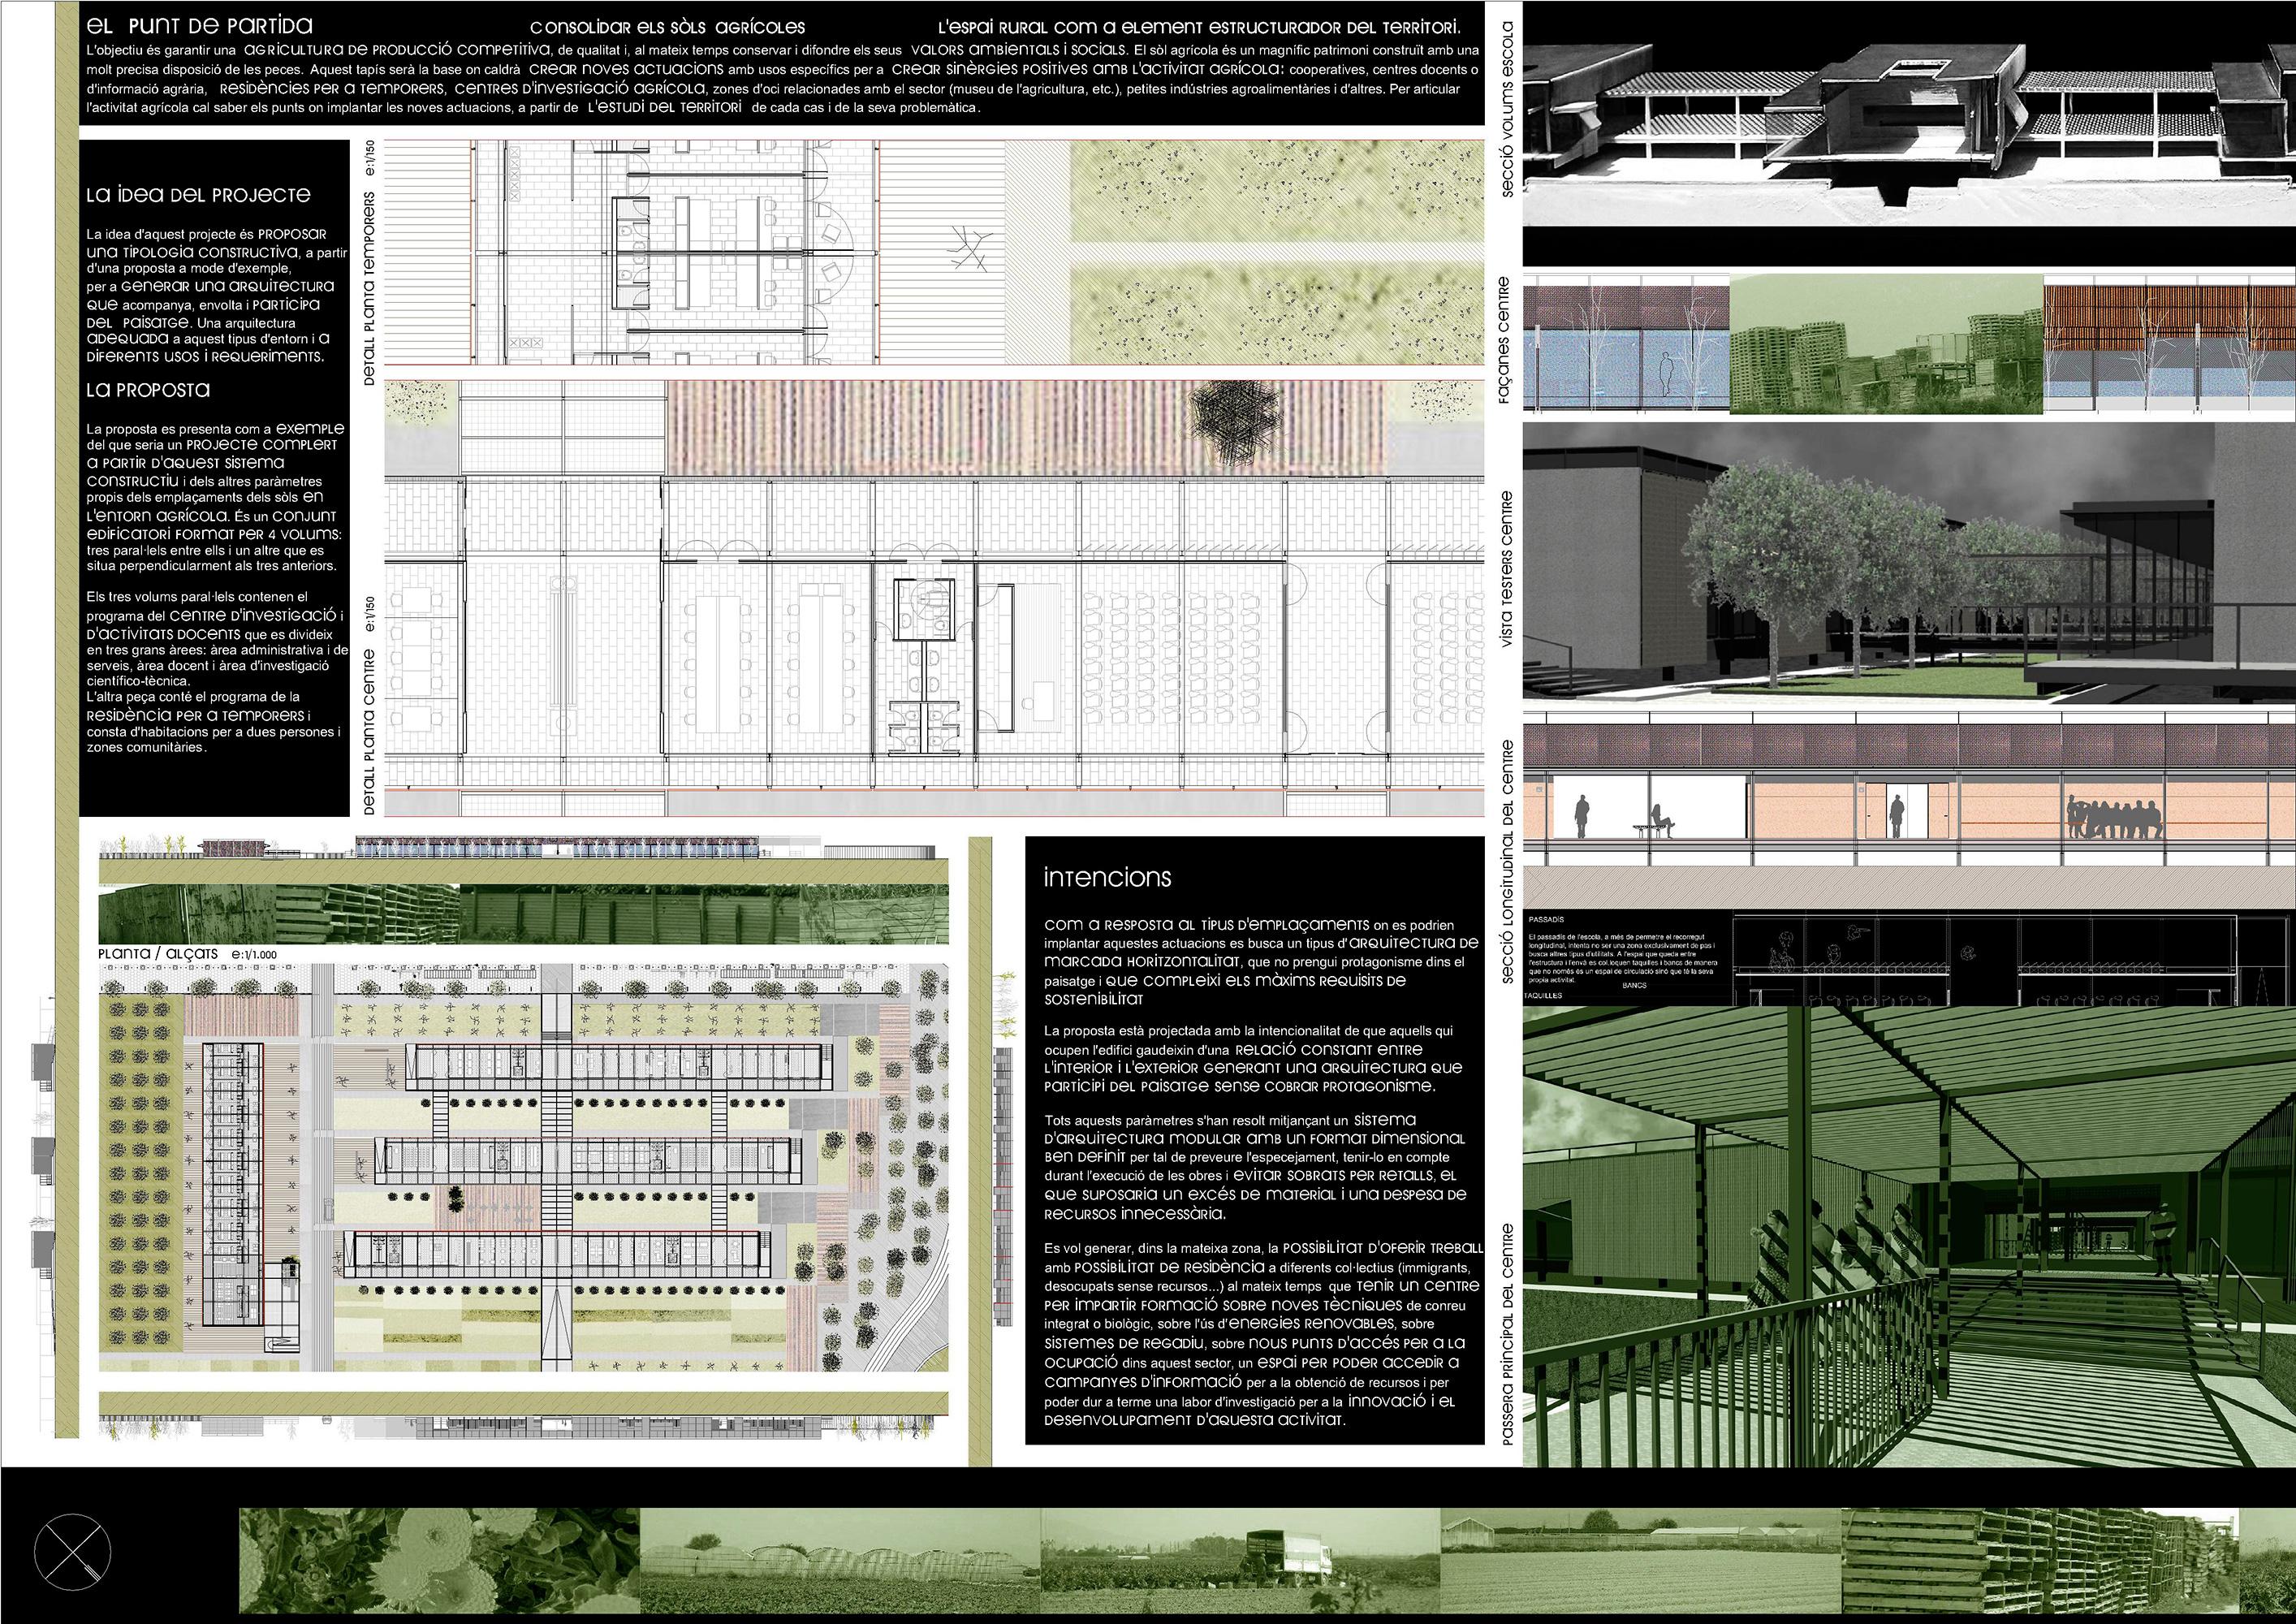 http://www.oa-arquitectes.com/wp-content/uploads/2018/05/02-3.jpg